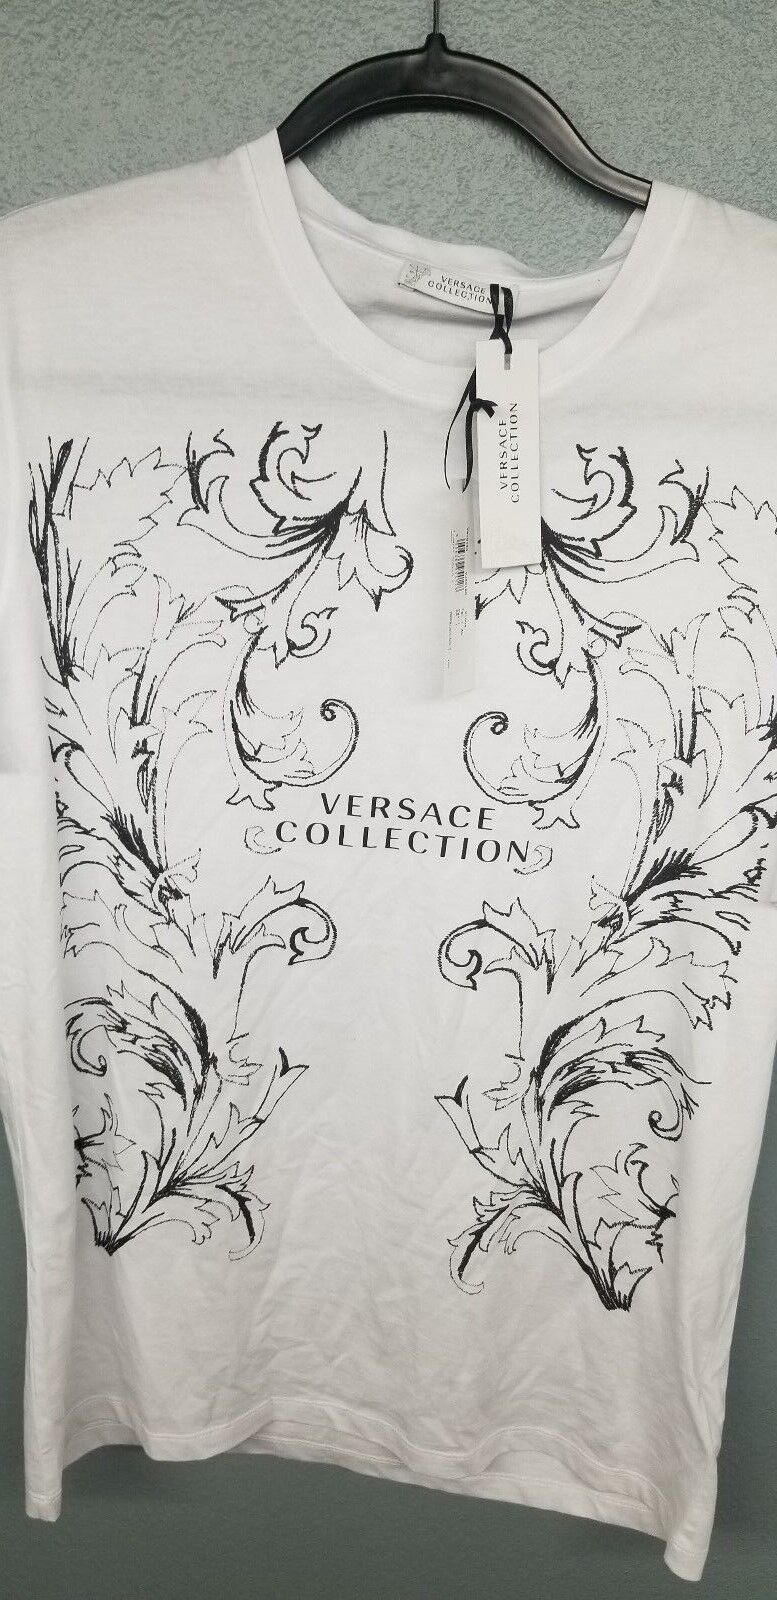 Versace collection Weiß logo hemd